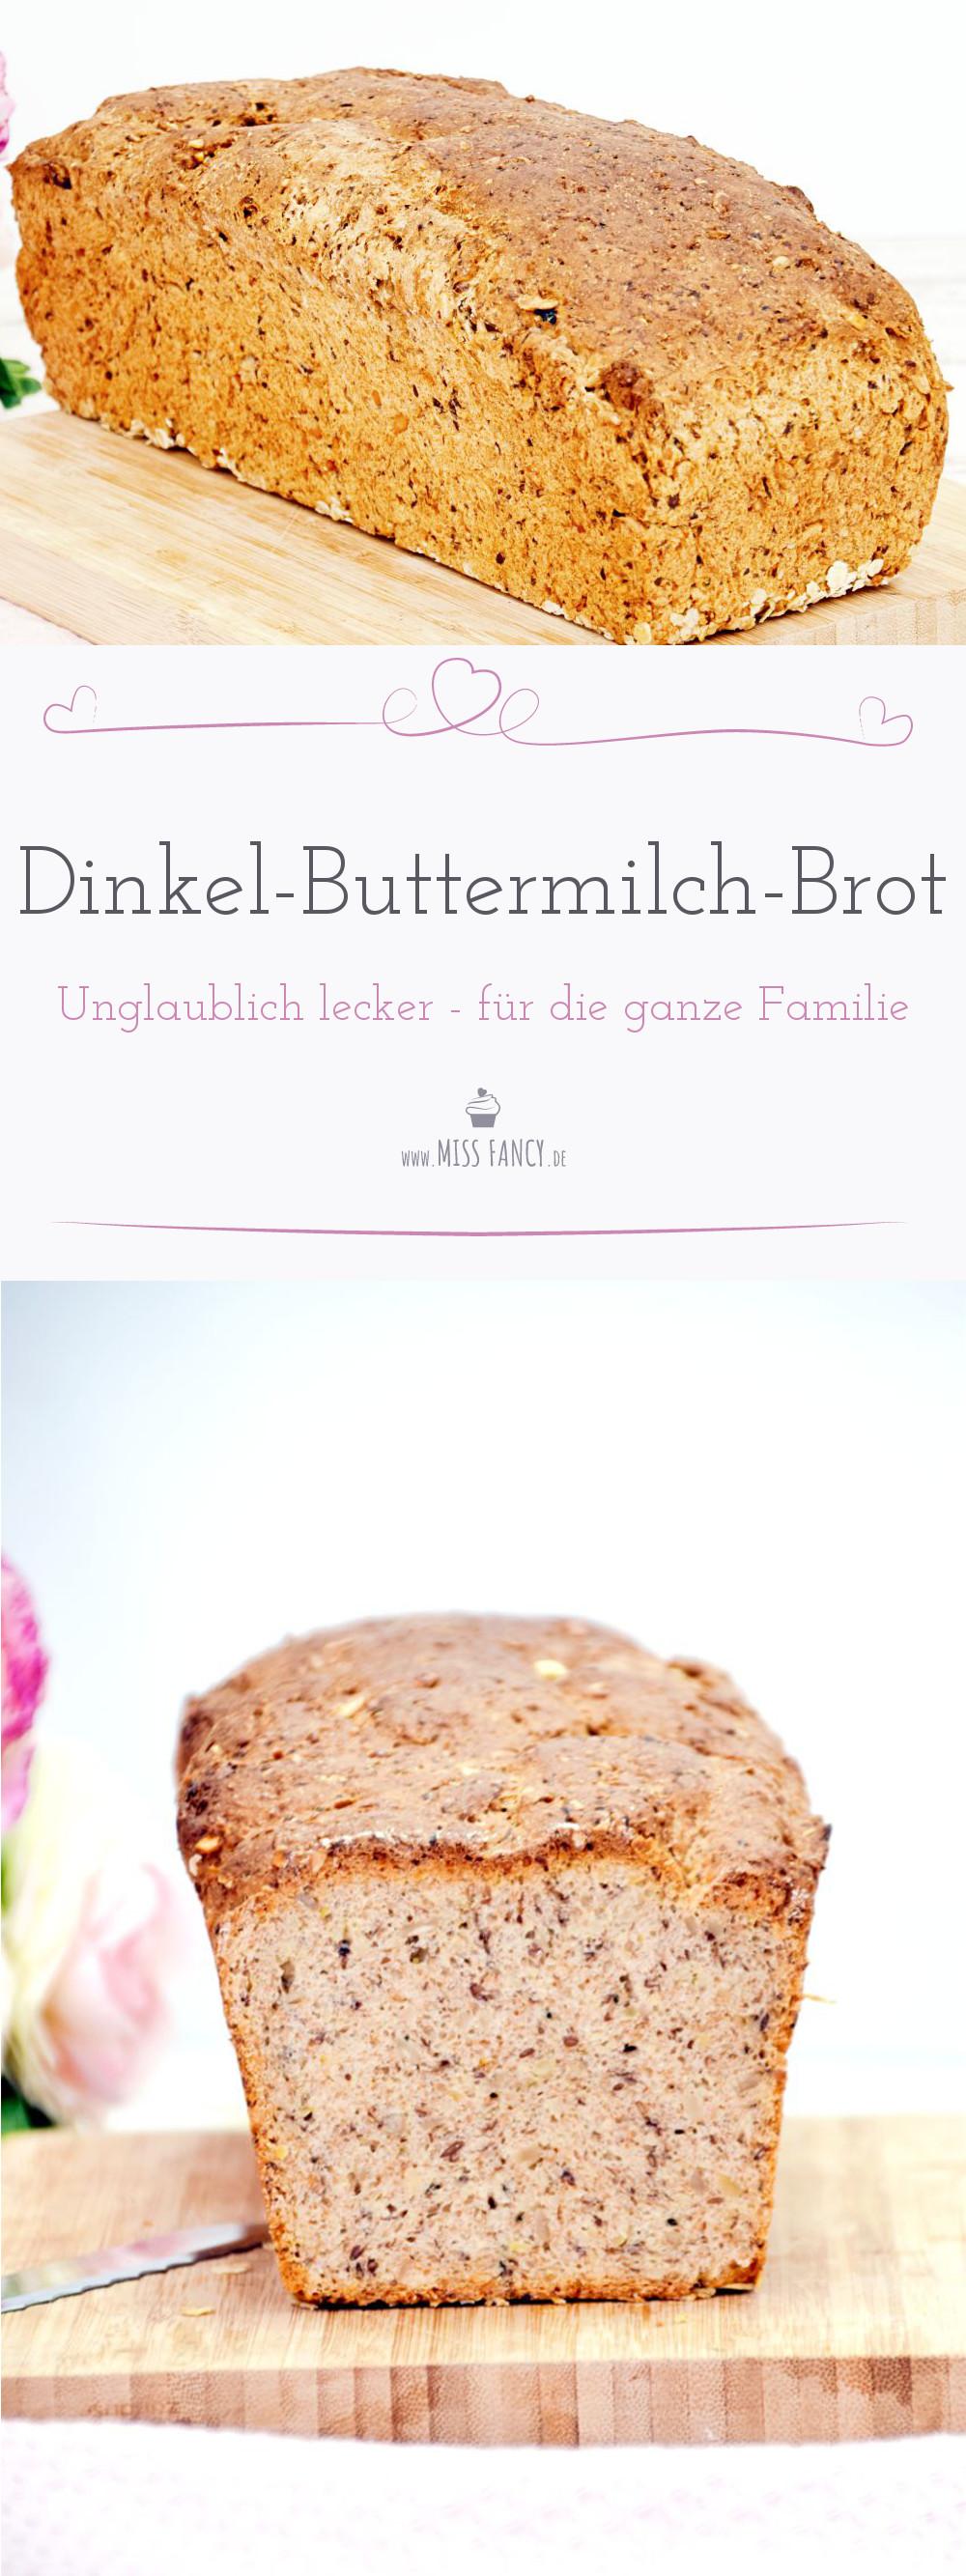 Rezept-Dinkel-Buttermilch-Brot